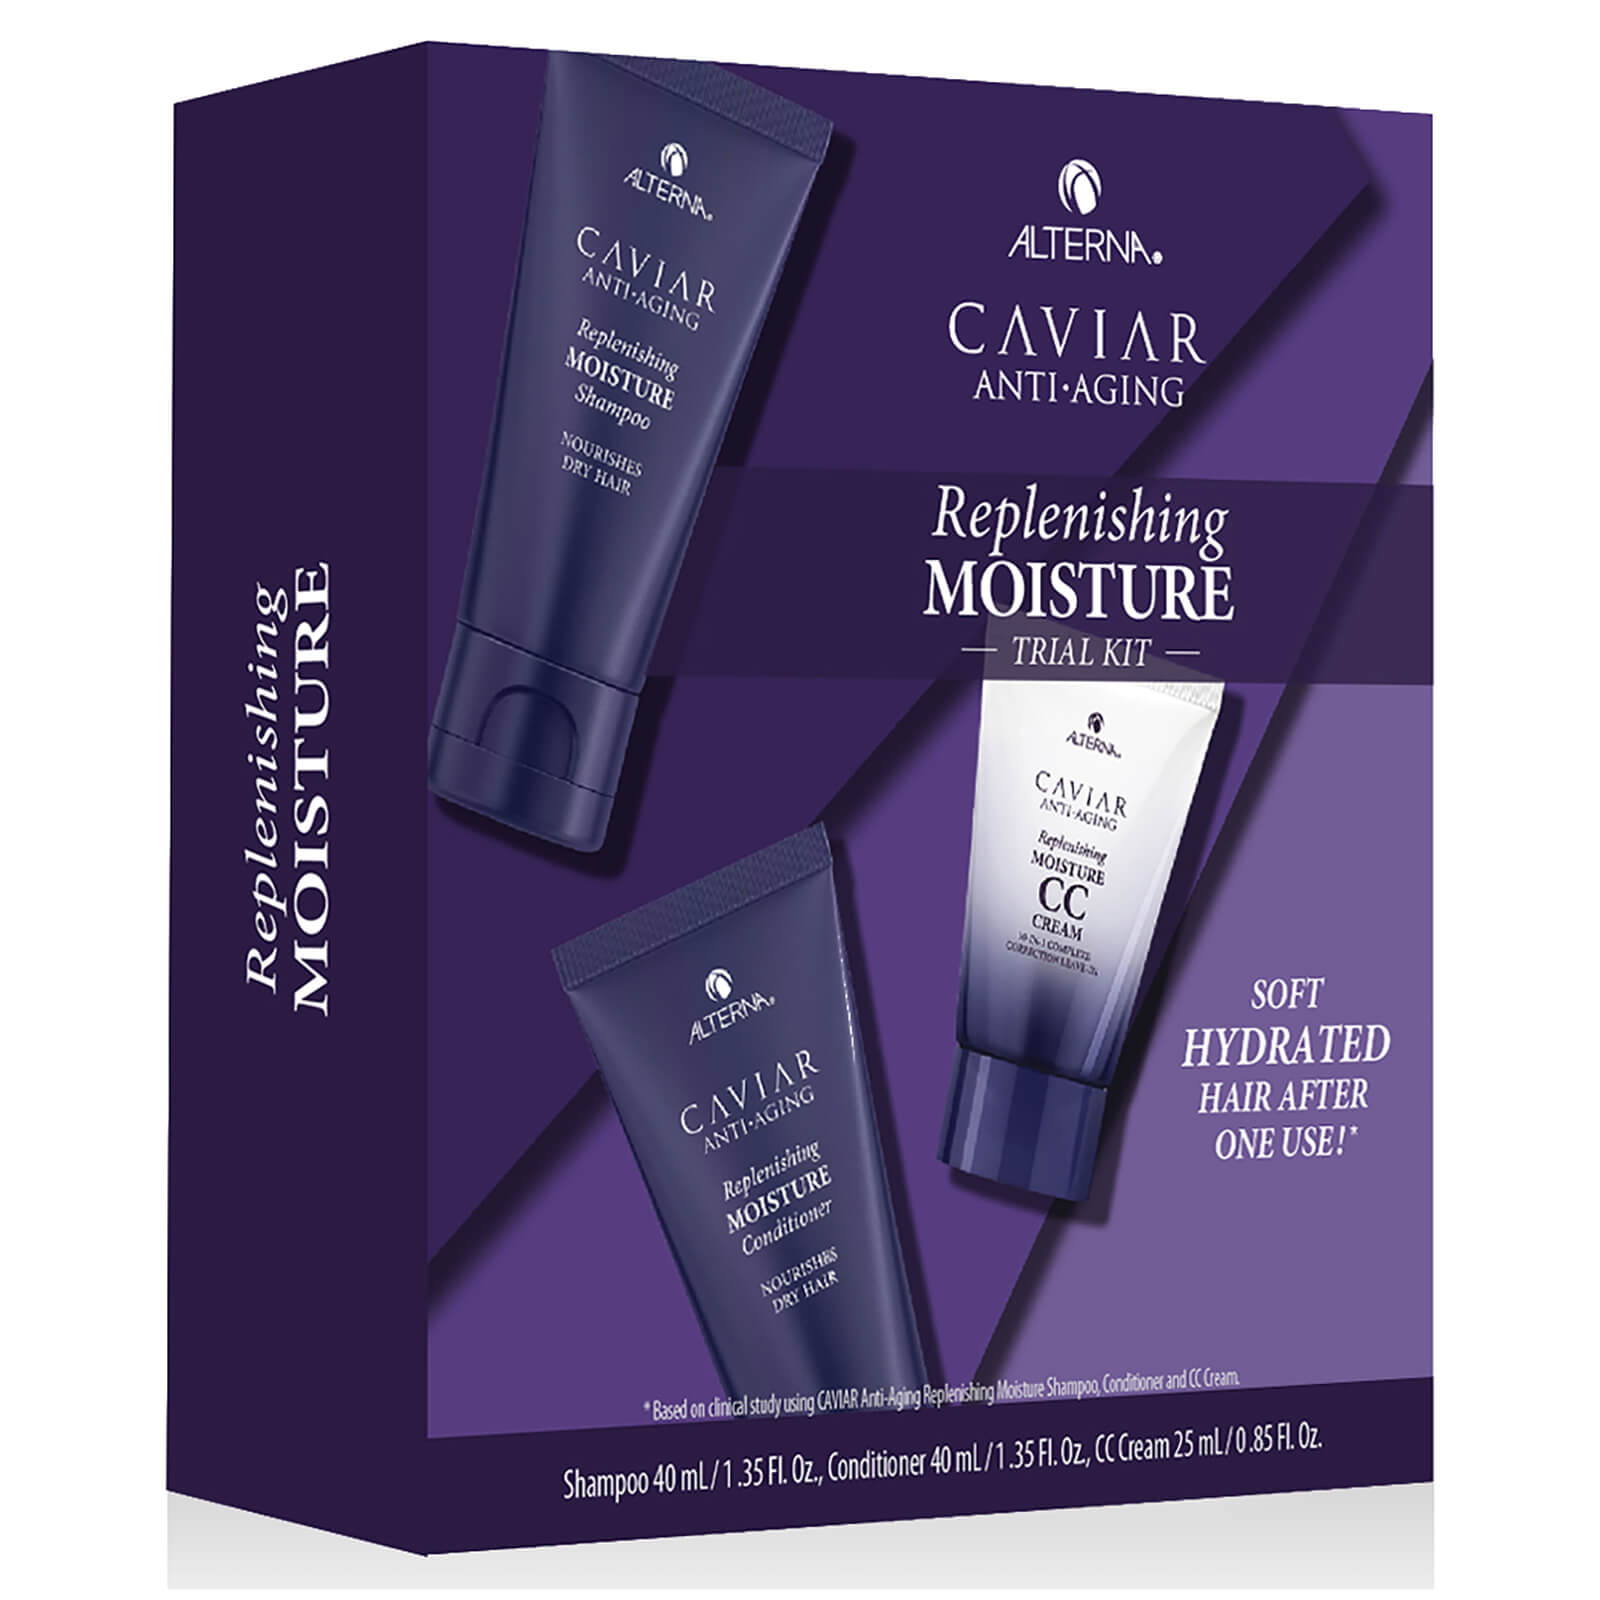 Alterna Caviar Moisture Consumer Trial Kit